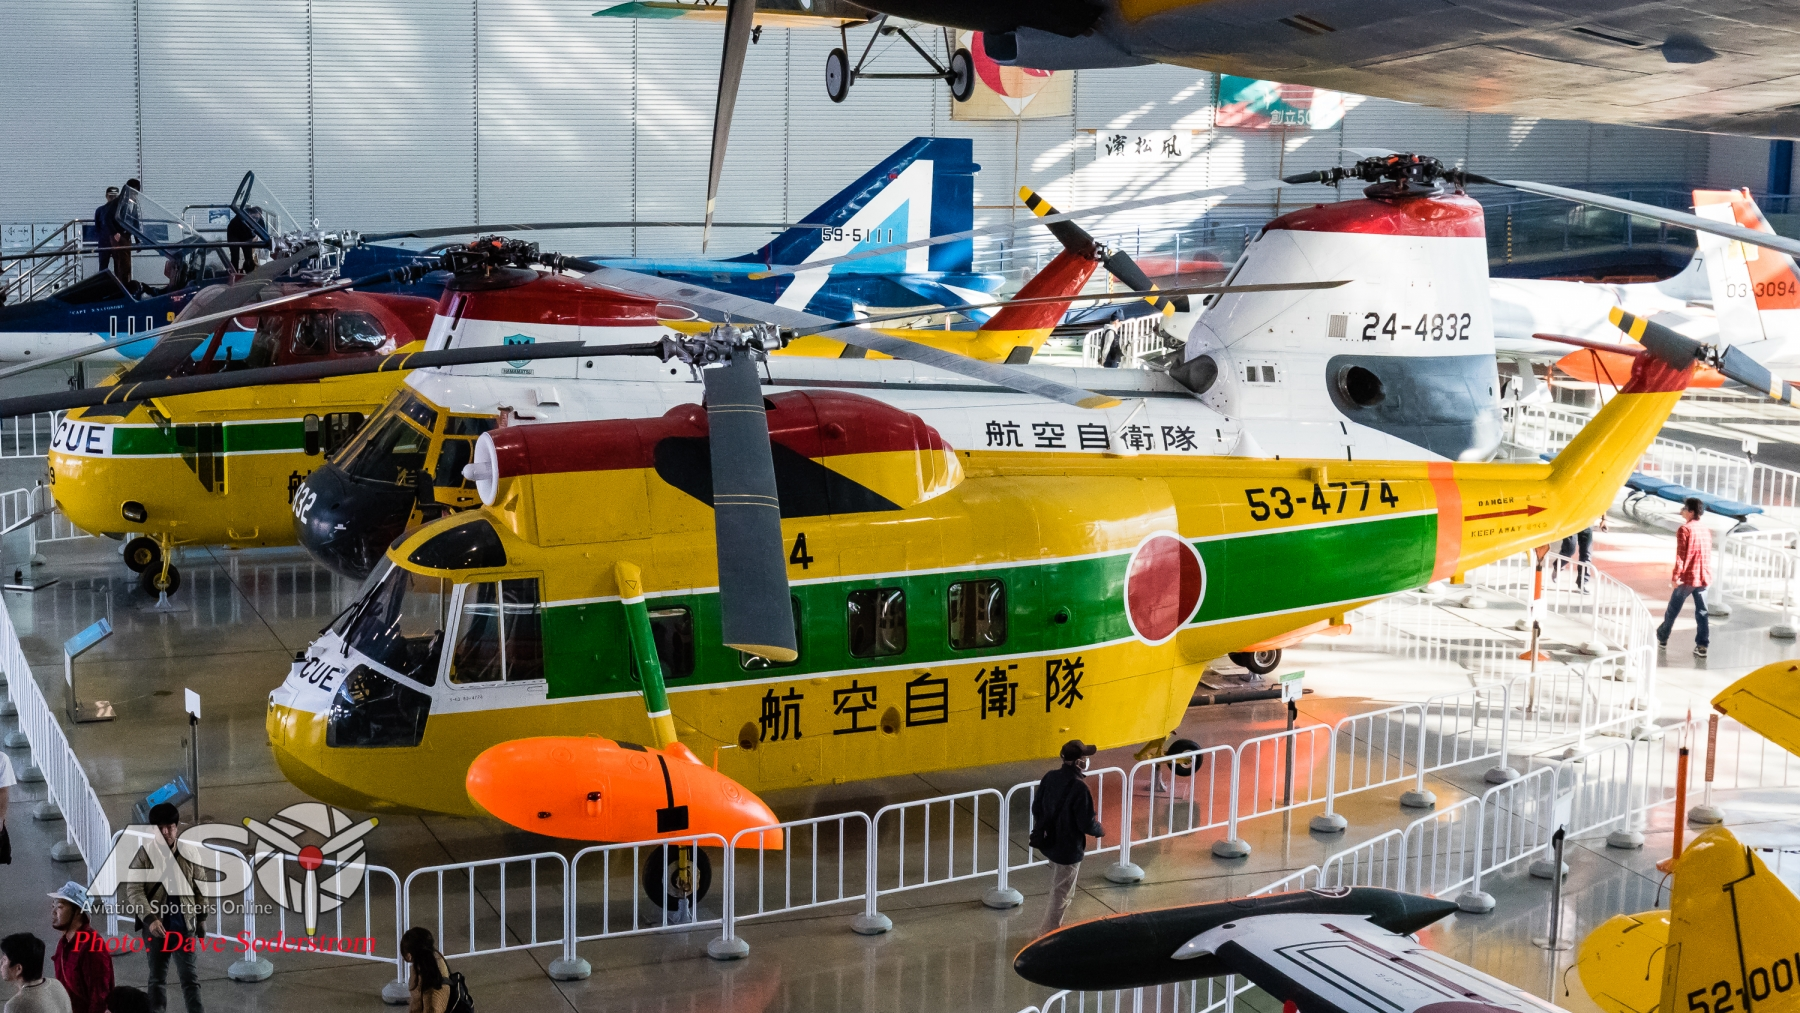 1_JASDF-Museum-2018-27-1-of-1